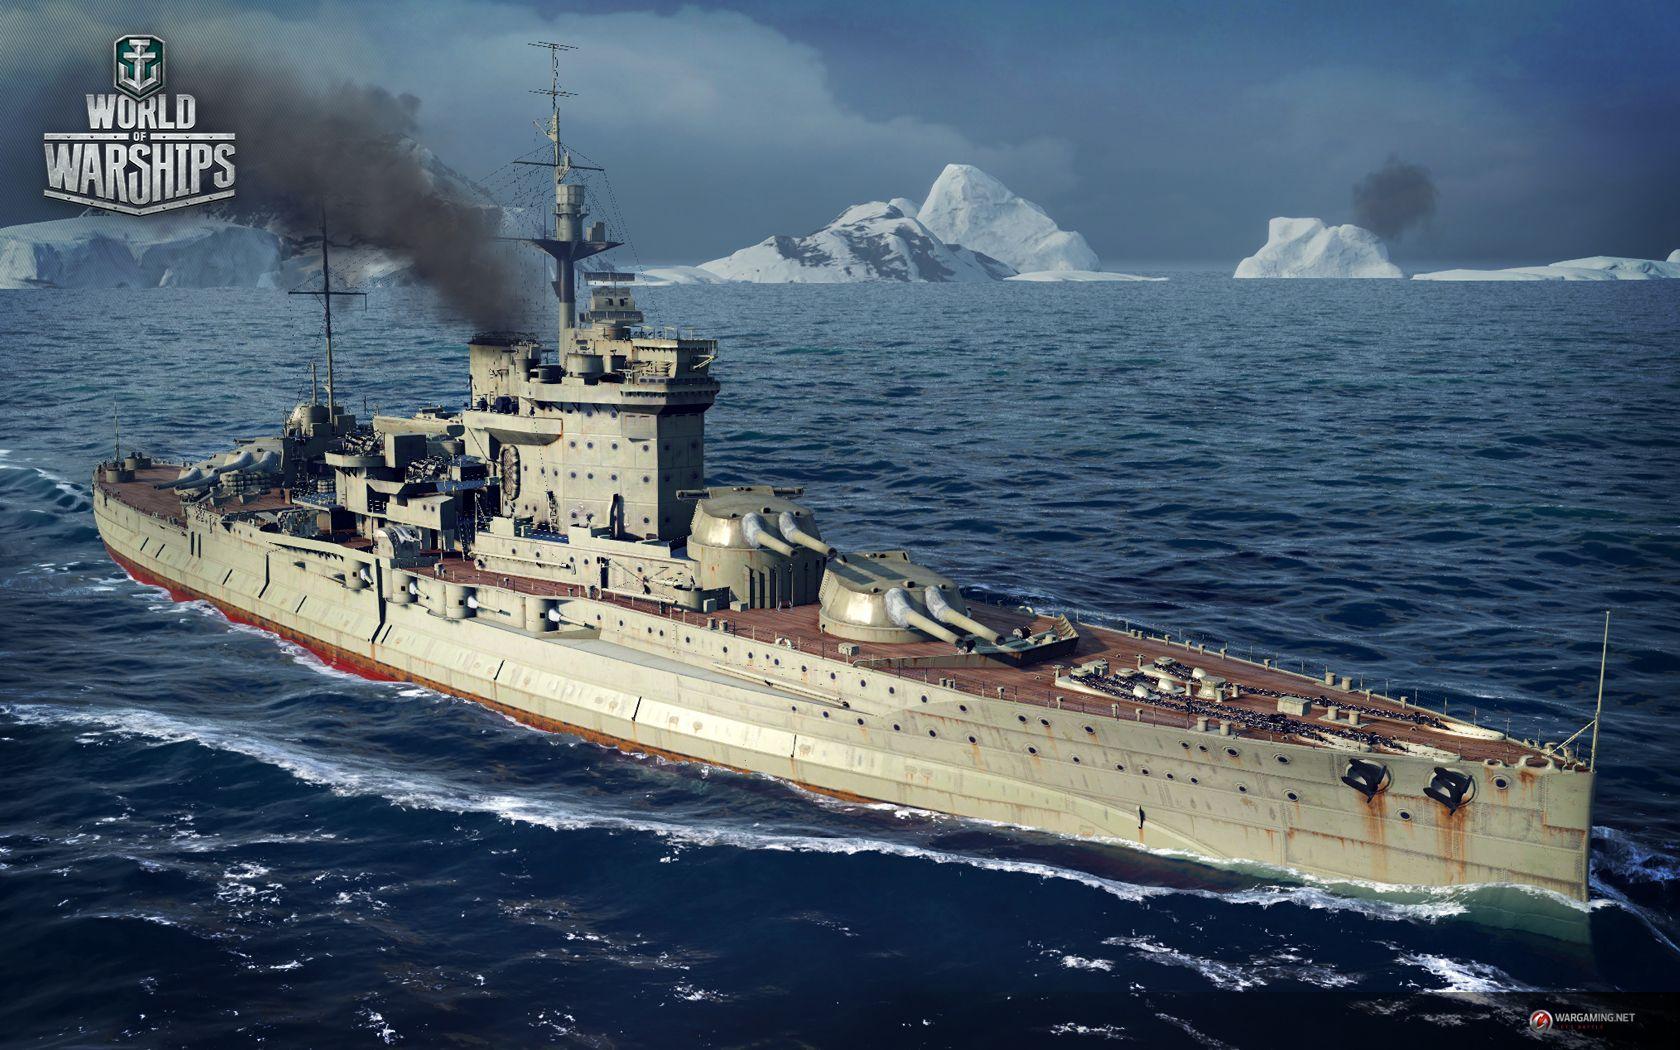 Hms warspite ingame art screenhots pinterest